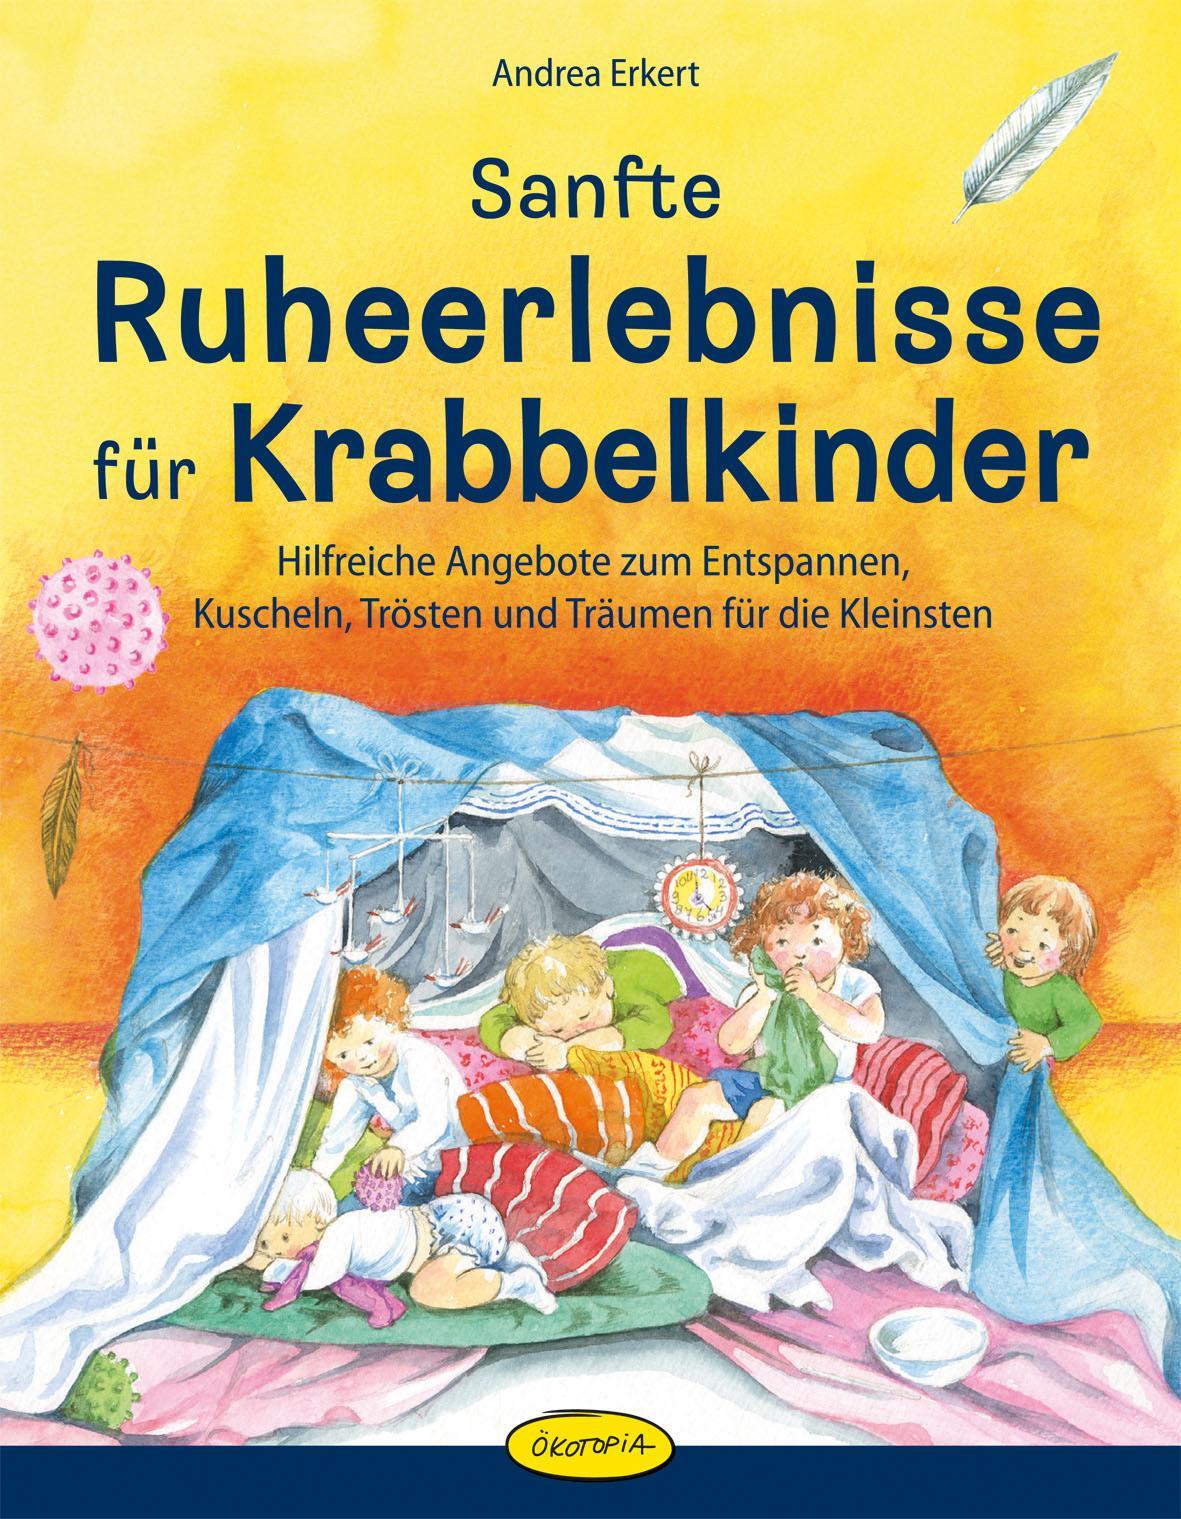 Sanfte Ruheerlebnisse für Krabbelkinder   Andrea Erkert    9783867022446